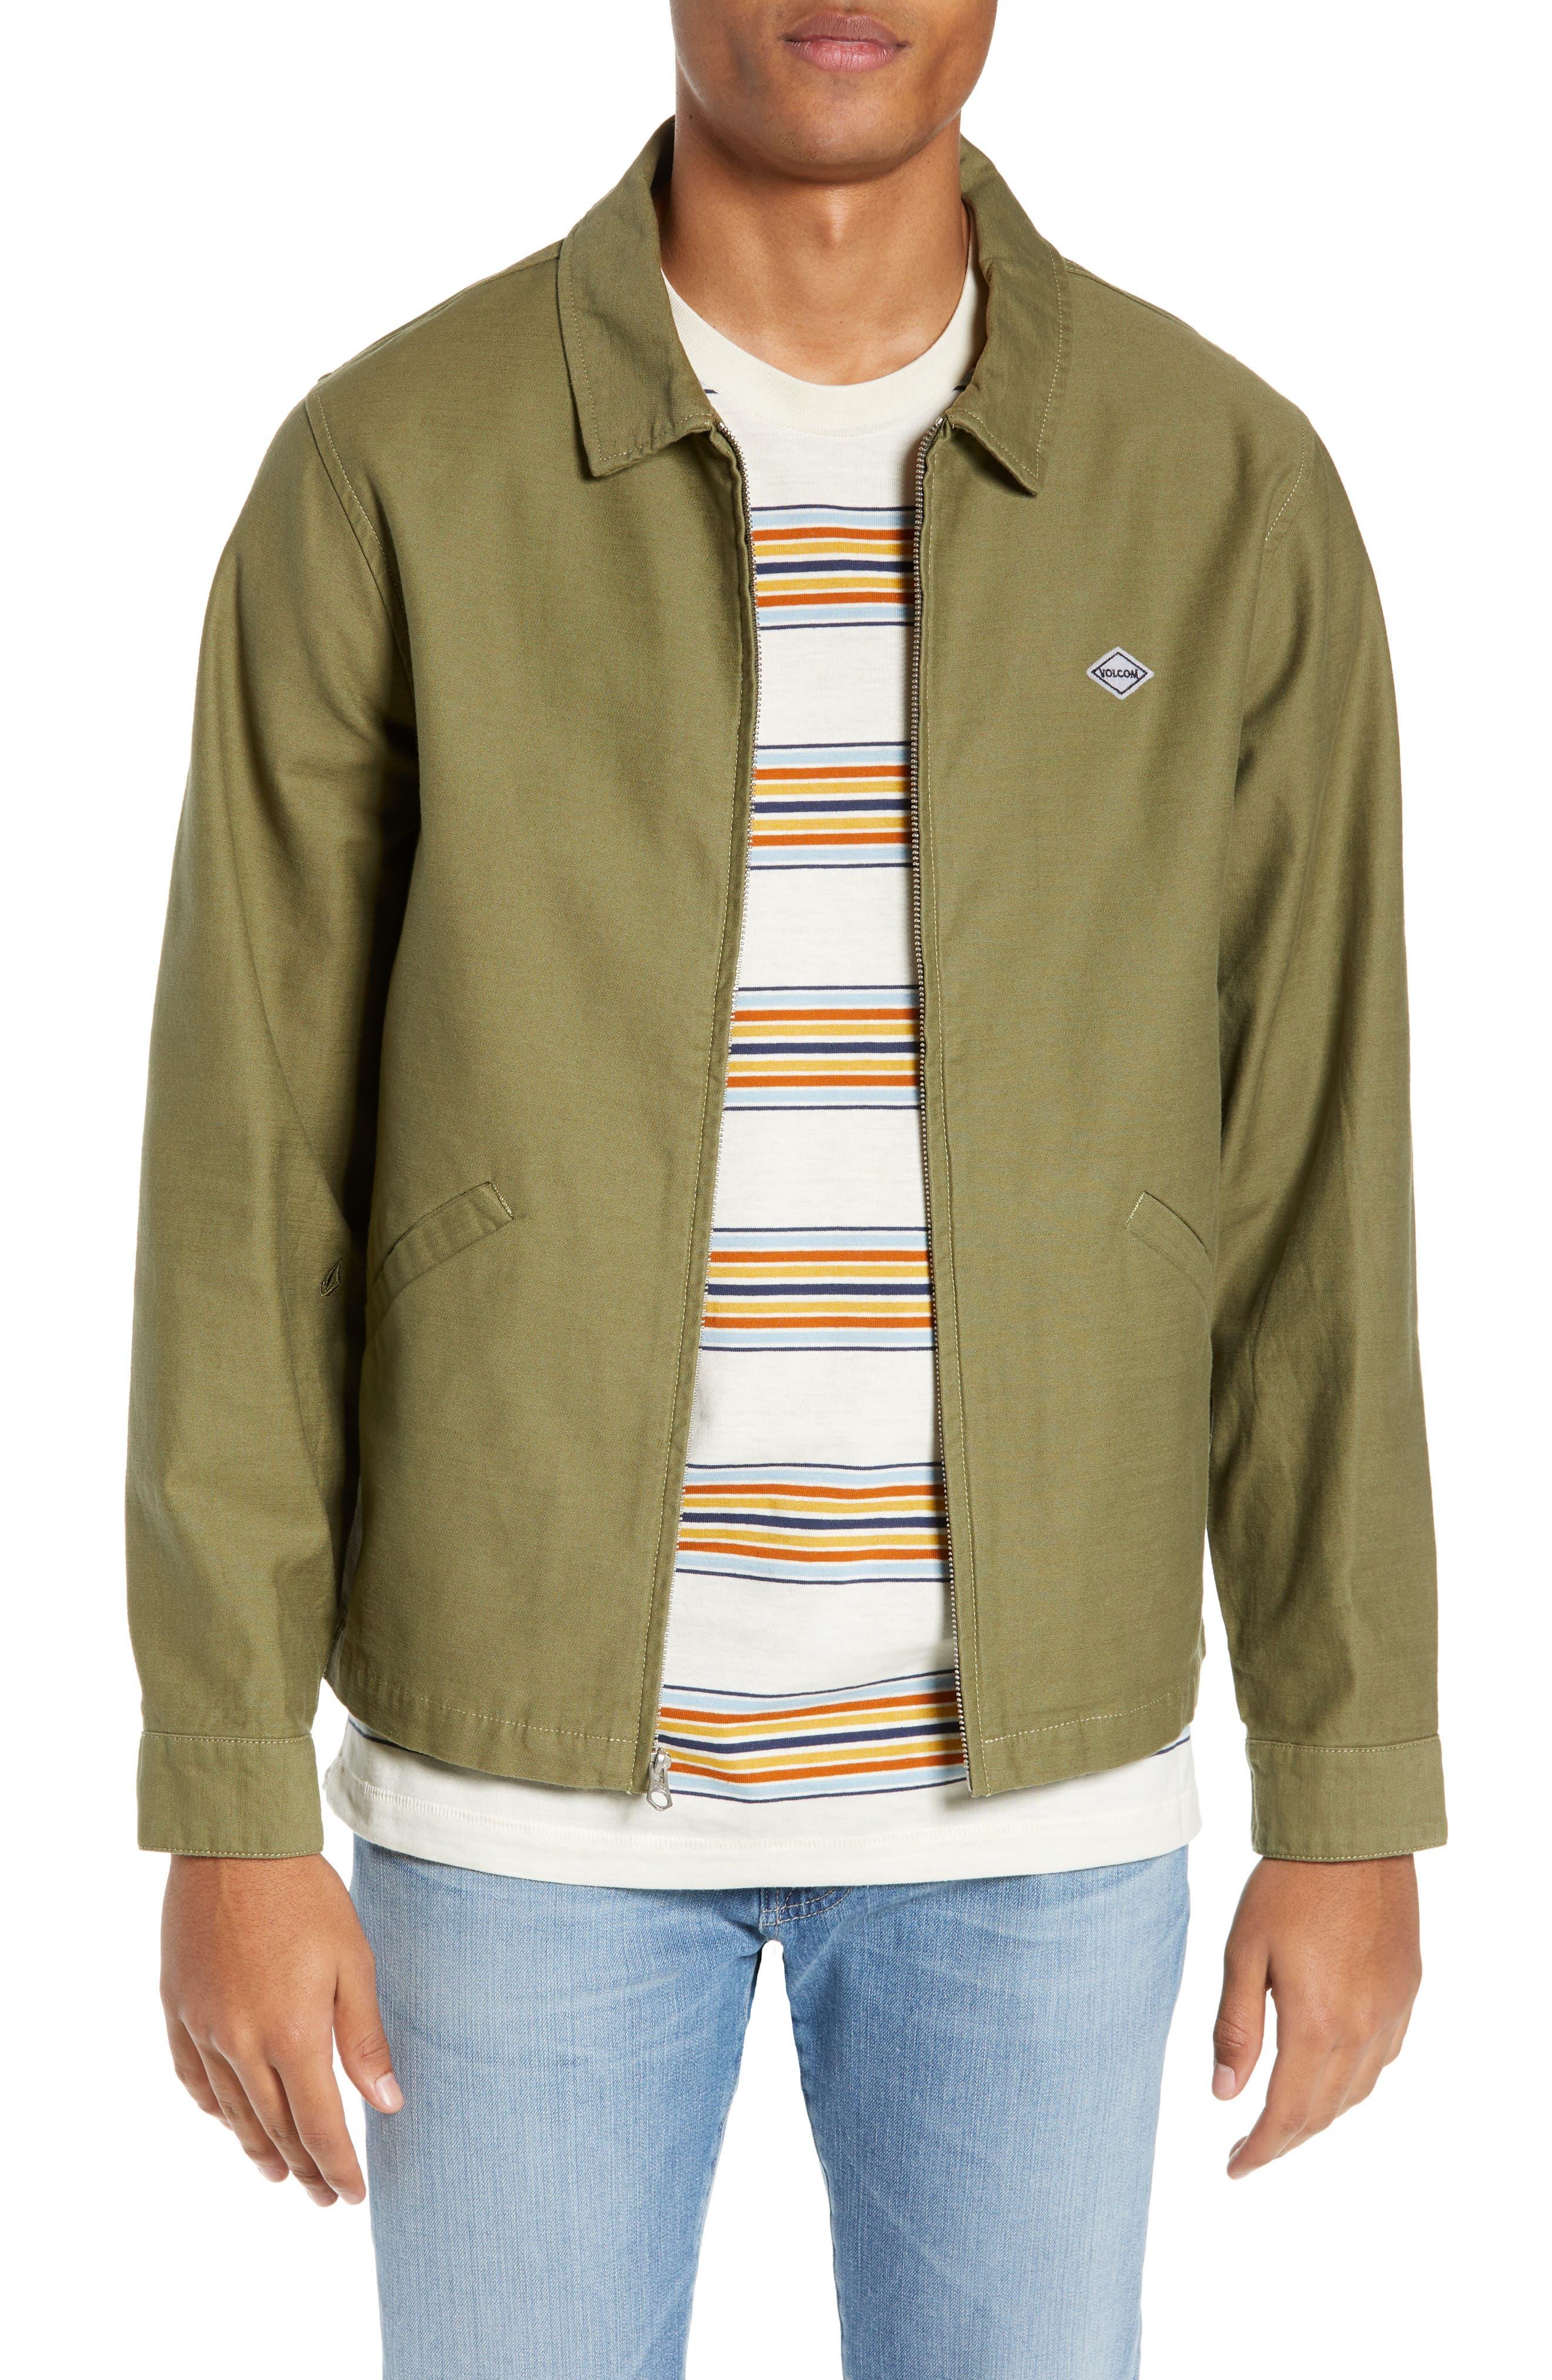 Burkey Jacket,                             Main thumbnail 1, color,                             VINE GREEN